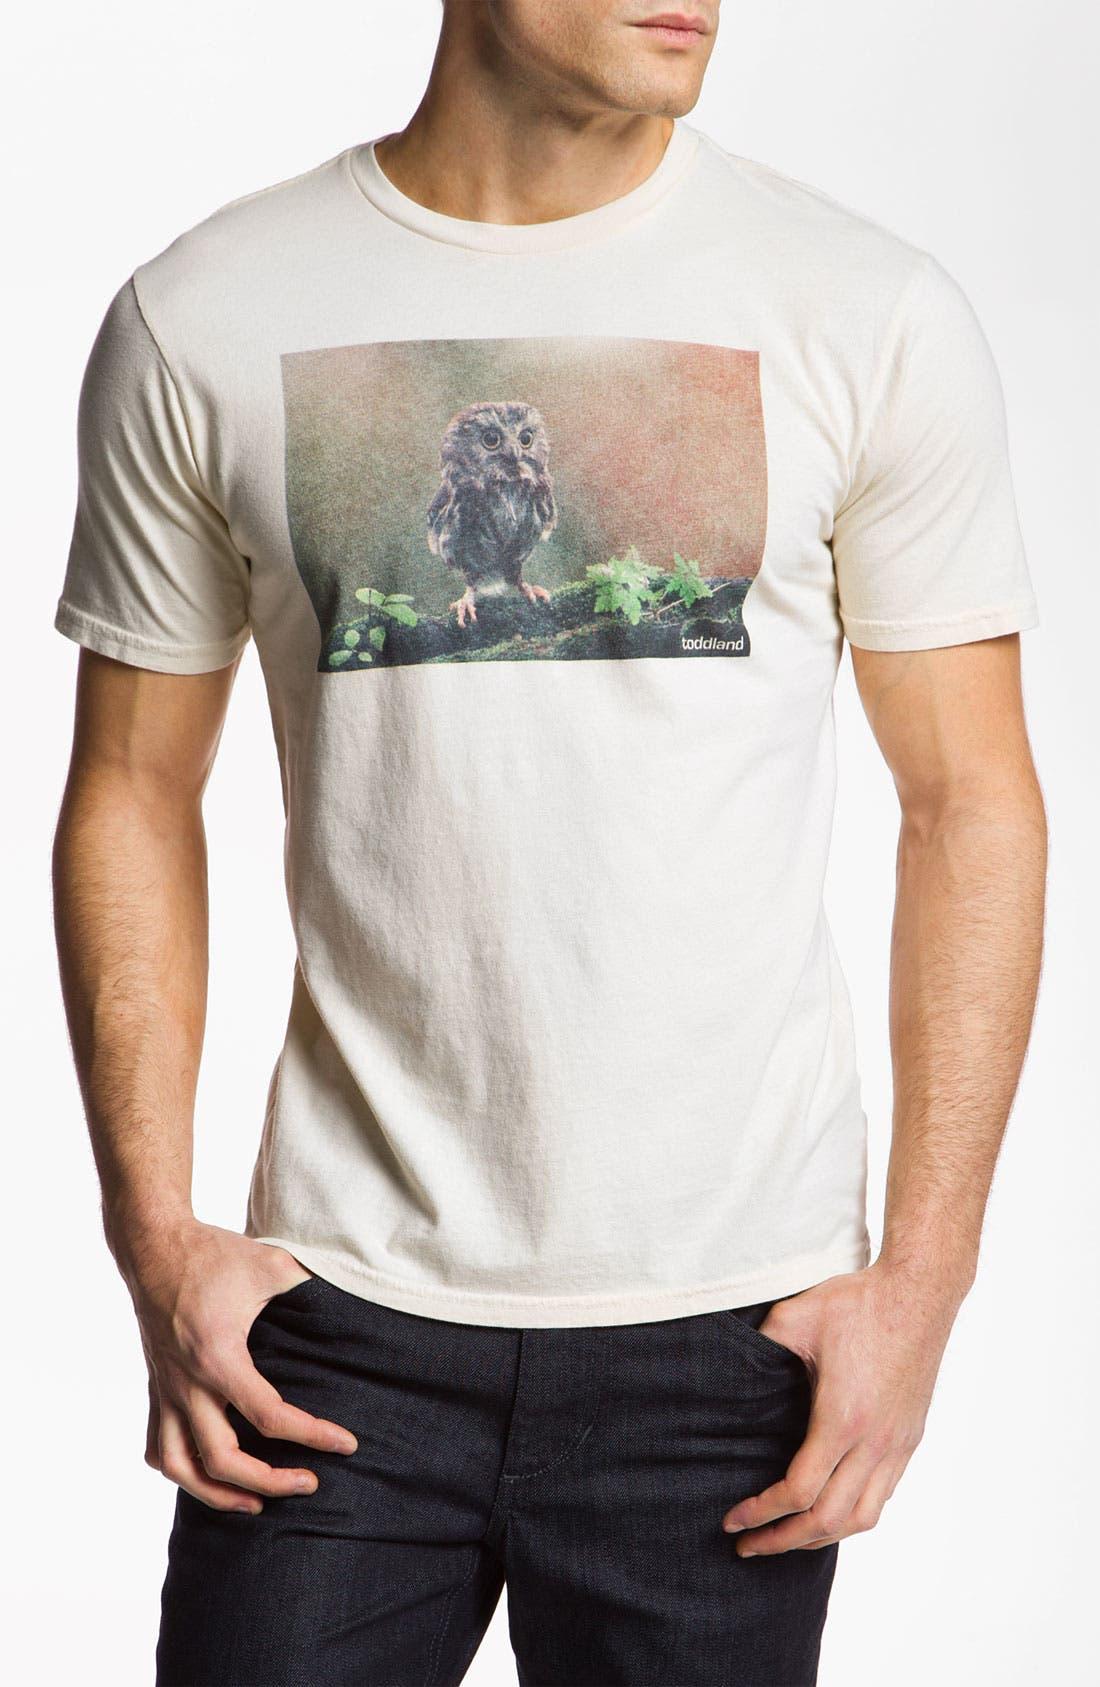 Main Image - Toddland 'Whet Owl' T-Shirt